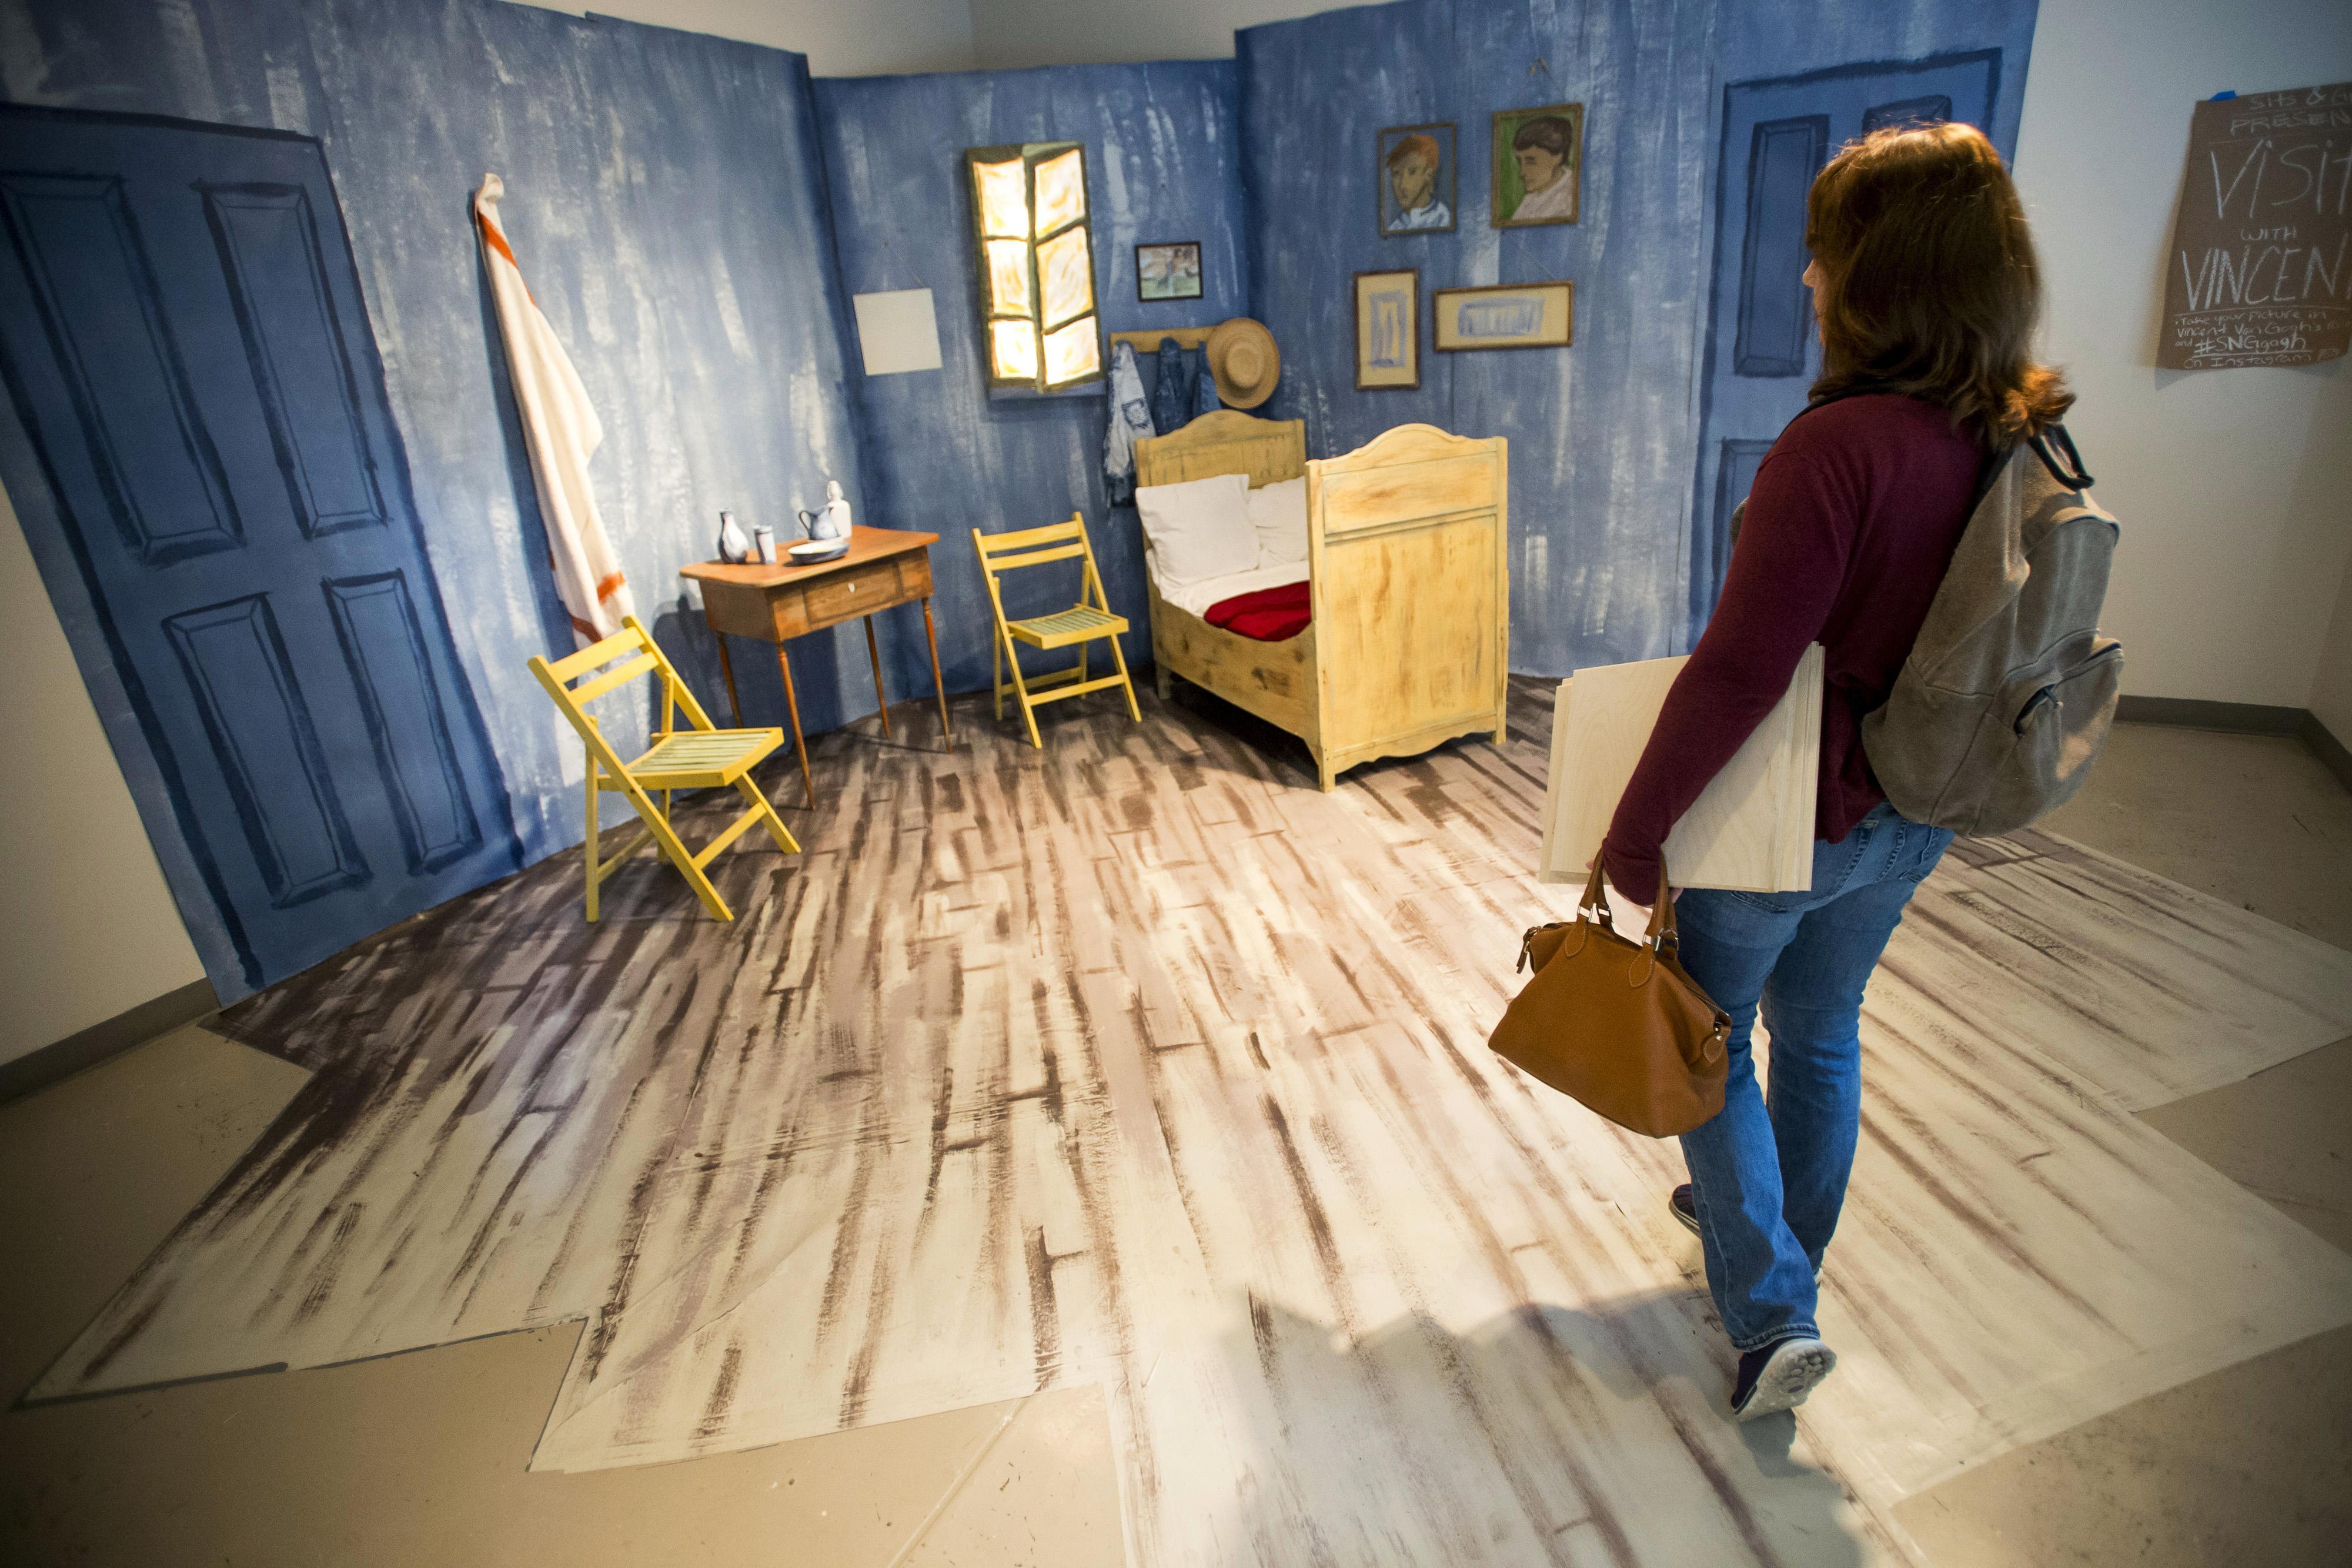 unl art students convert vincent van gogh's 'bedroom' - washington